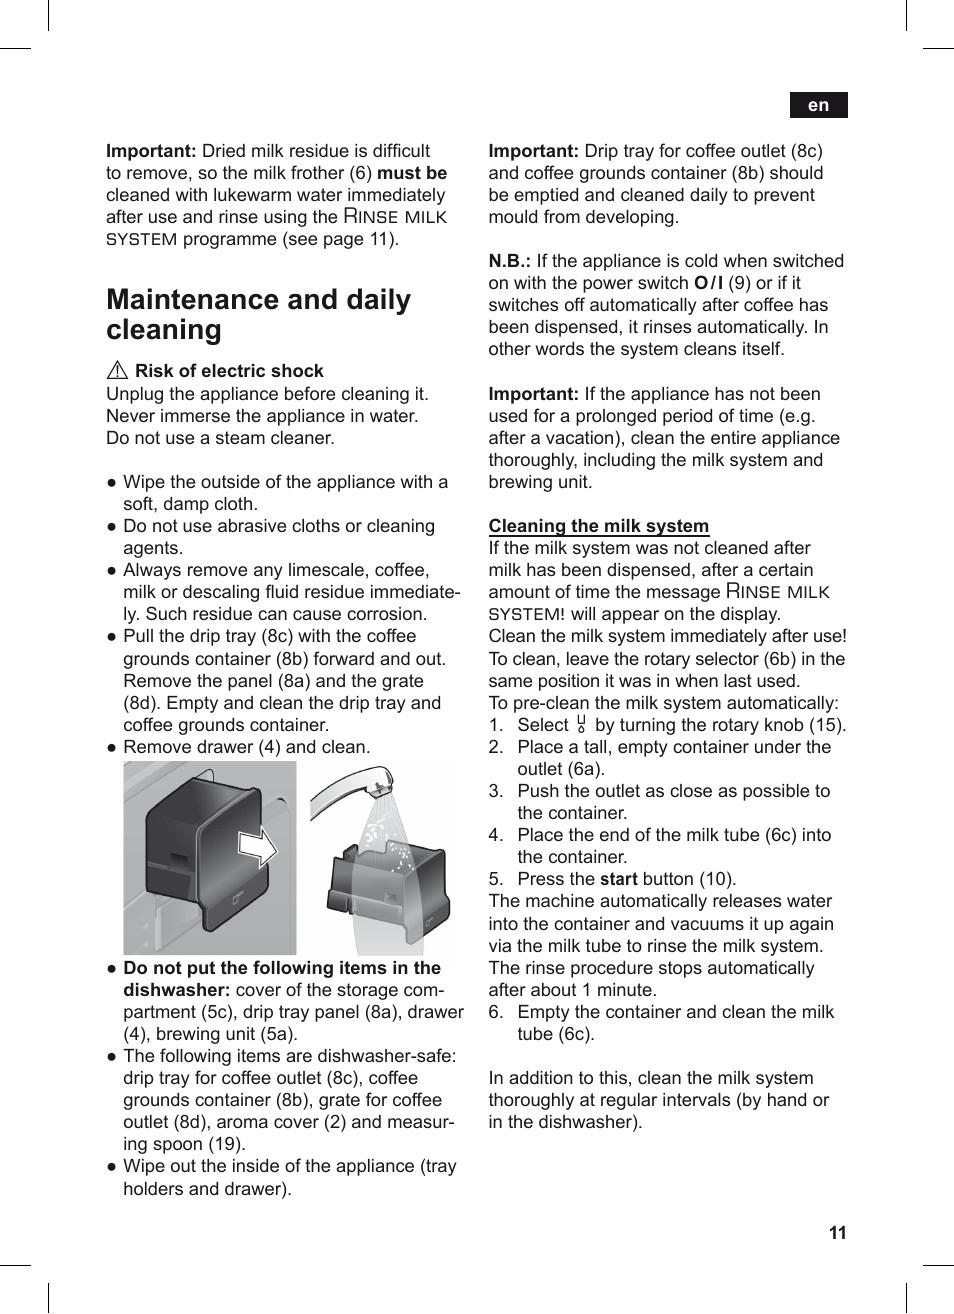 maintenance and daily cleaning rinse milk system siemens rh manualsdir com Dishwasher Siemens ManualDownload siemens instruction manual dishwasher